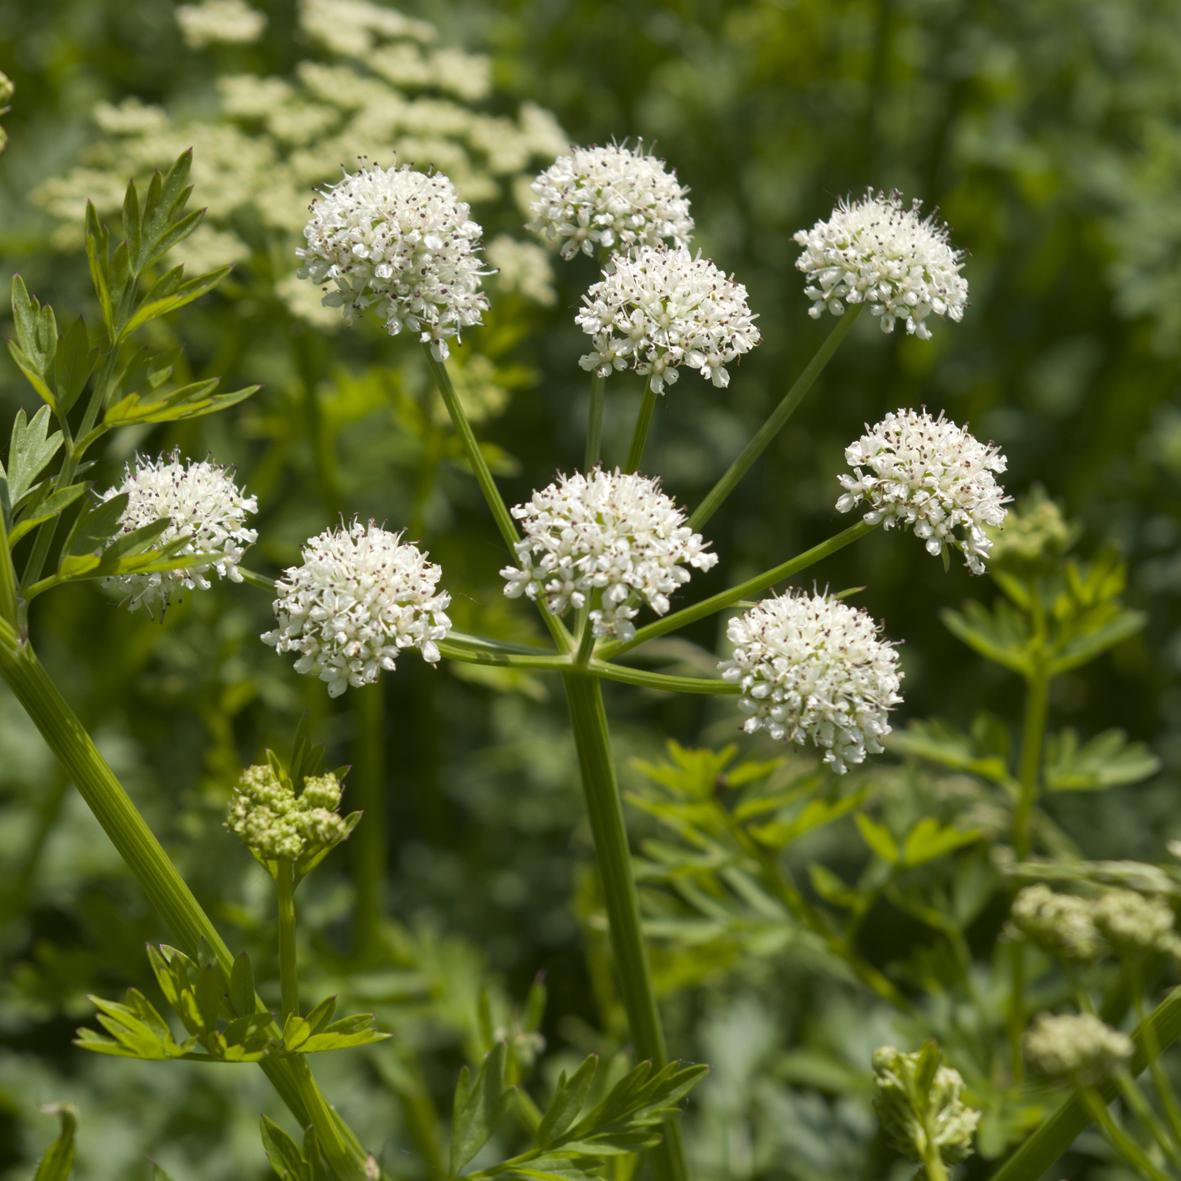 Umbelliferae flowers